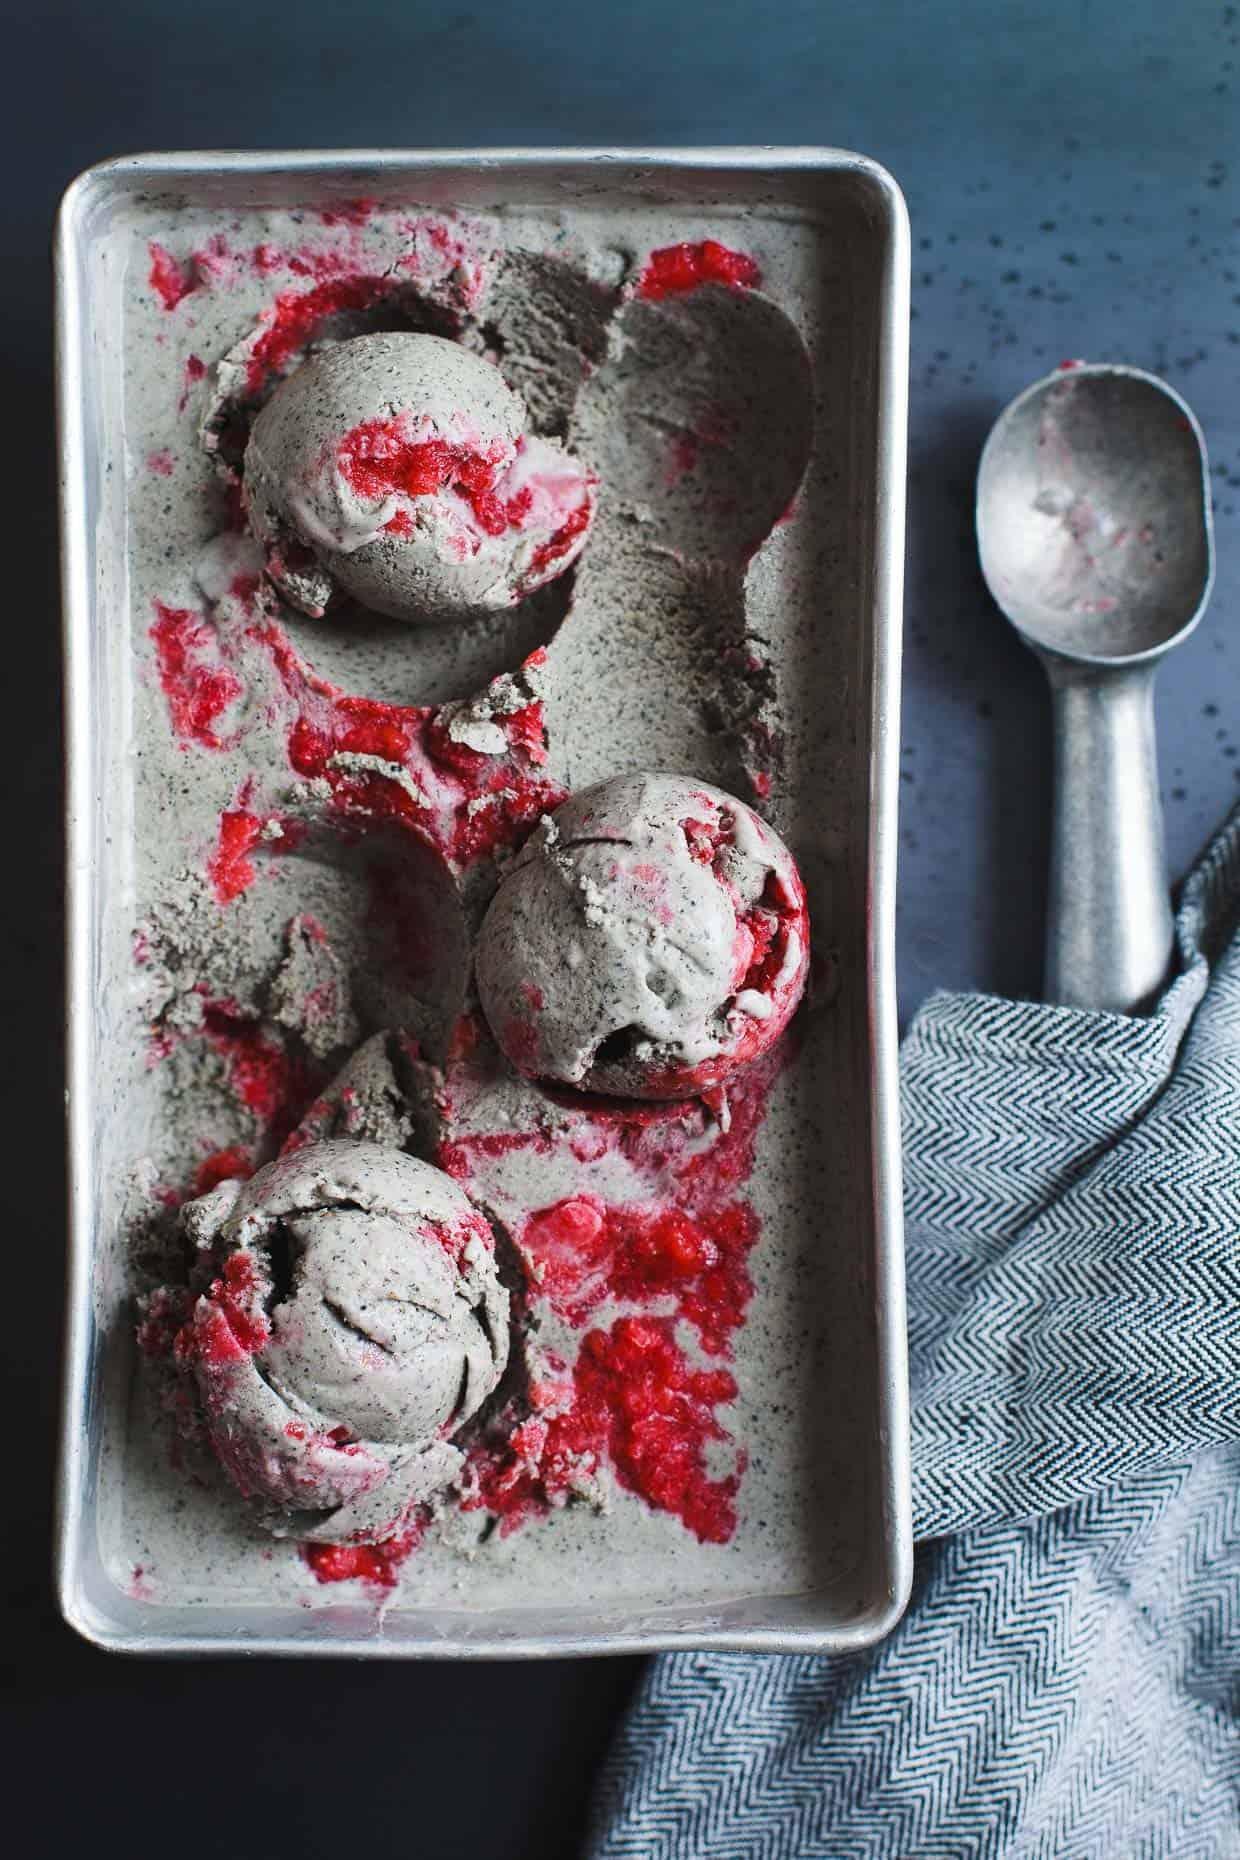 Vegan Coconut Black Sesame-Ice Cream with Strawberry Swirl